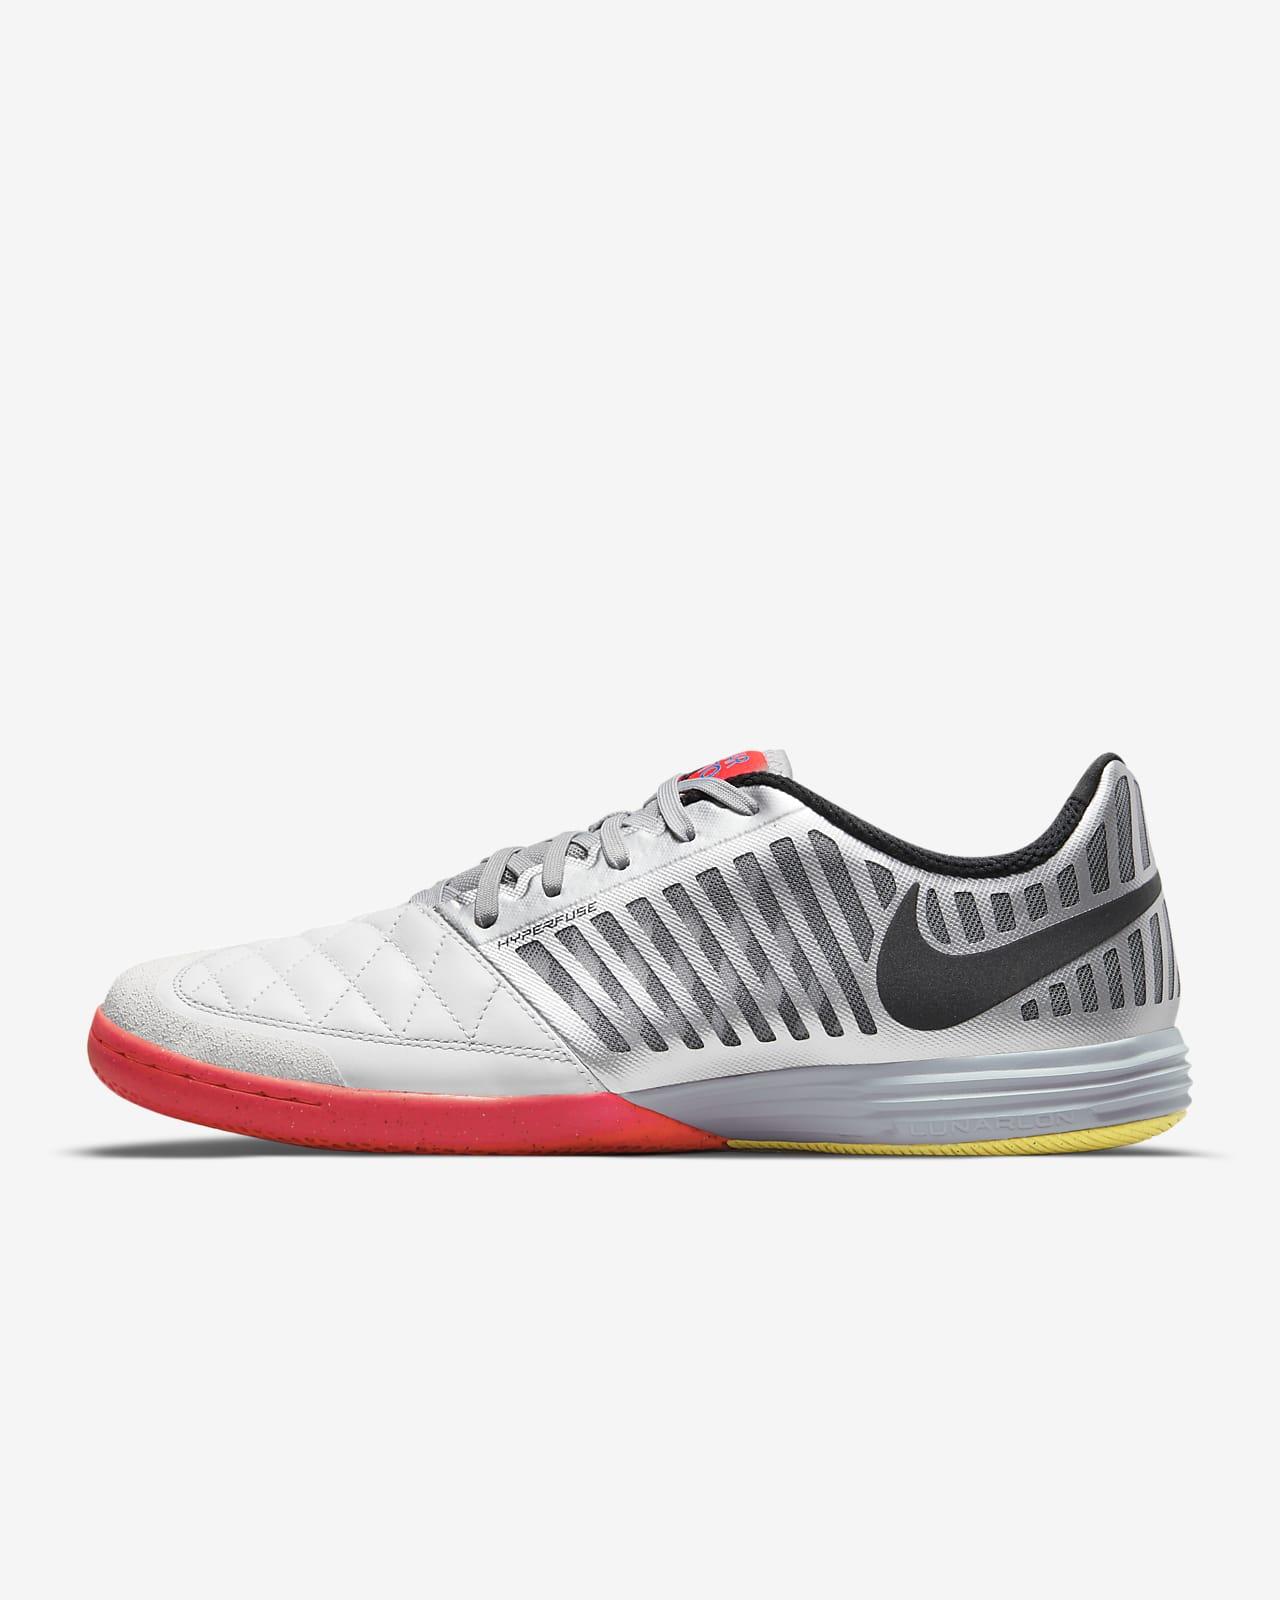 Chaussure de football en salle Nike Lunar Gato II IC. Nike FR